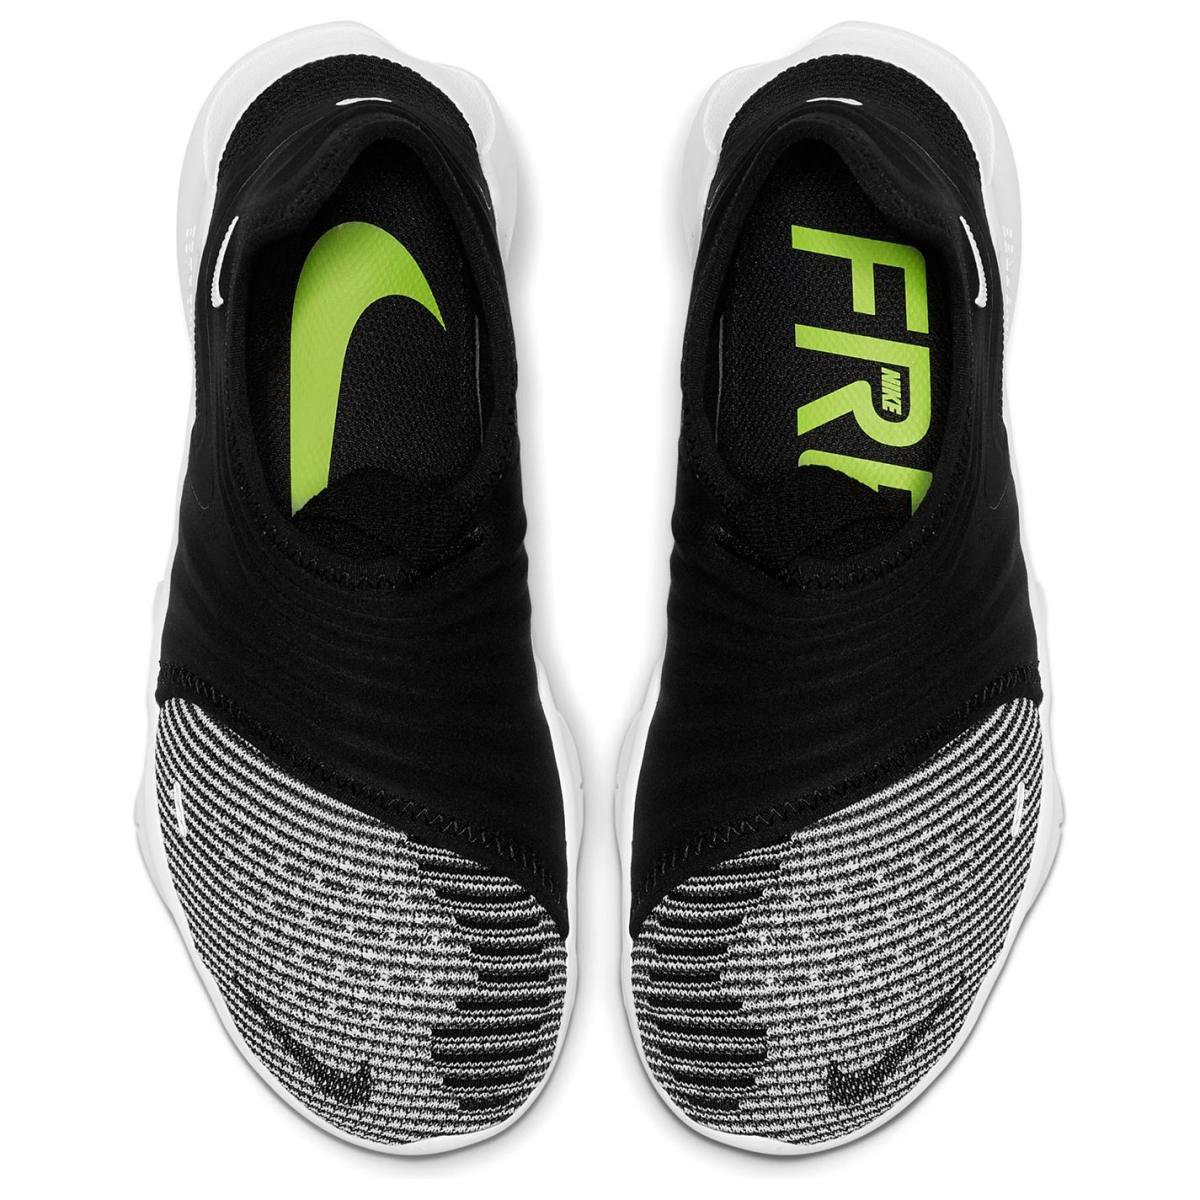 Nike-Free-Run-Flyknit-3-0-Turnschuhe-Damen-Sneaker-Sportschuhe-Laufschuhe-4450 Indexbild 6